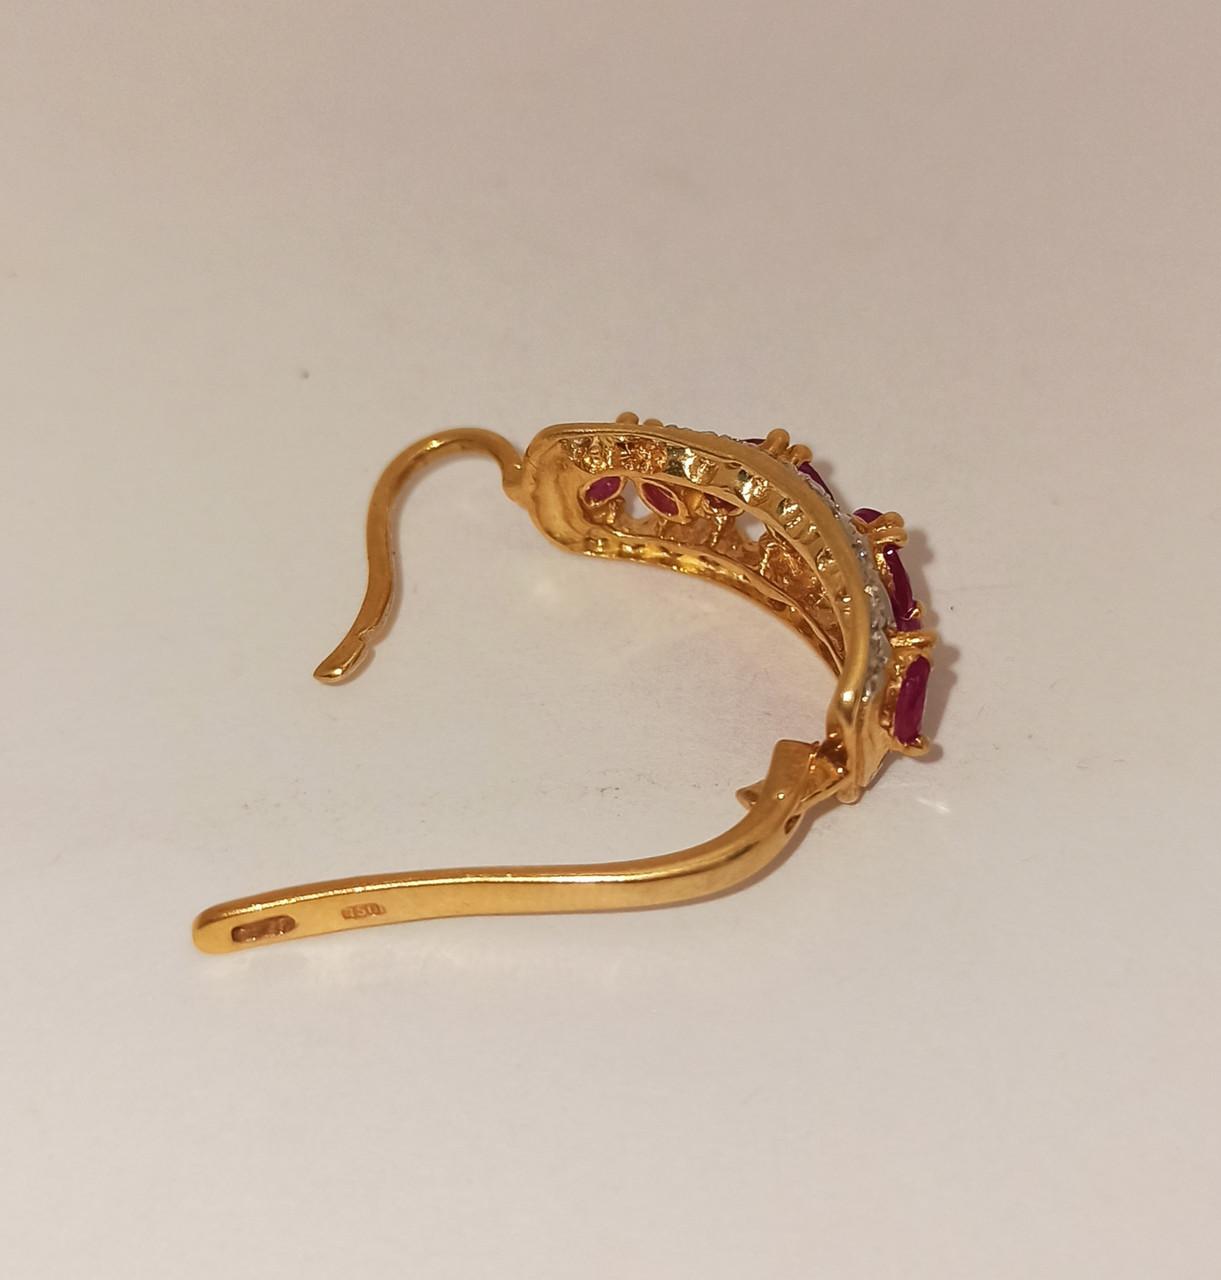 Золотой комплект с бриллиантами и рубинами - фото 8